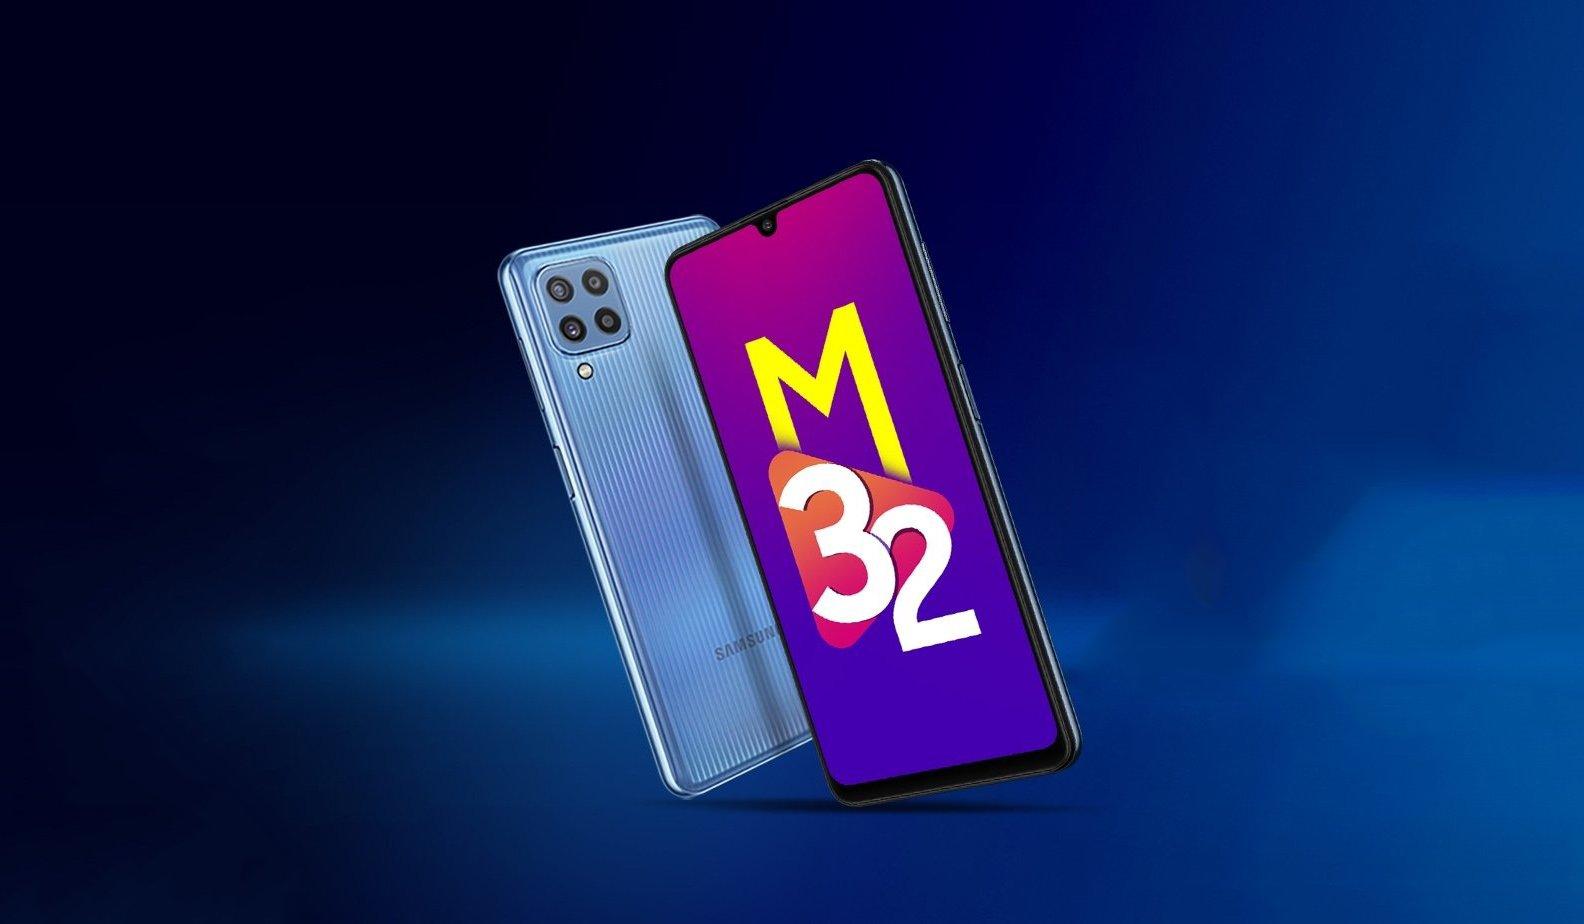 Samsung Galaxy M32 India